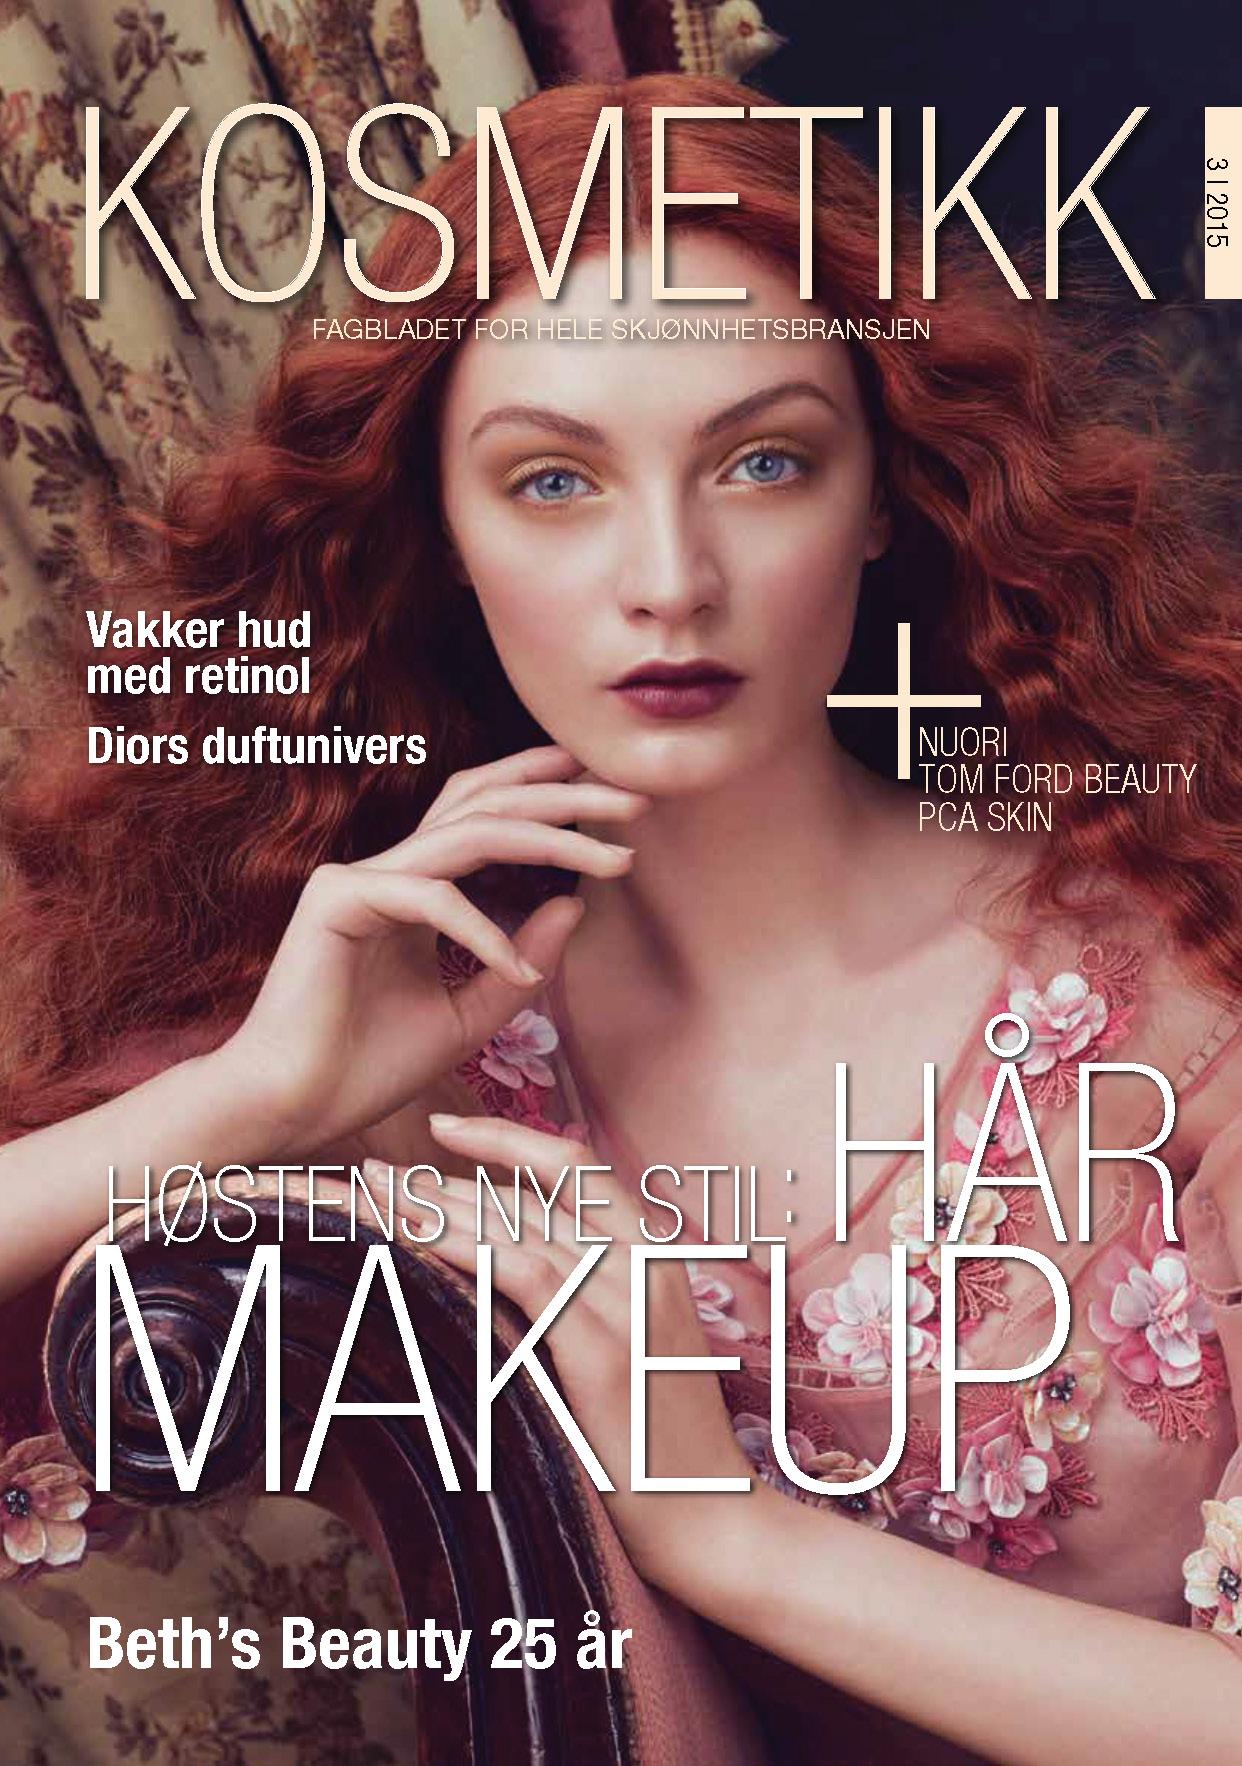 Kosmetikk cover 032015 copy.jpg